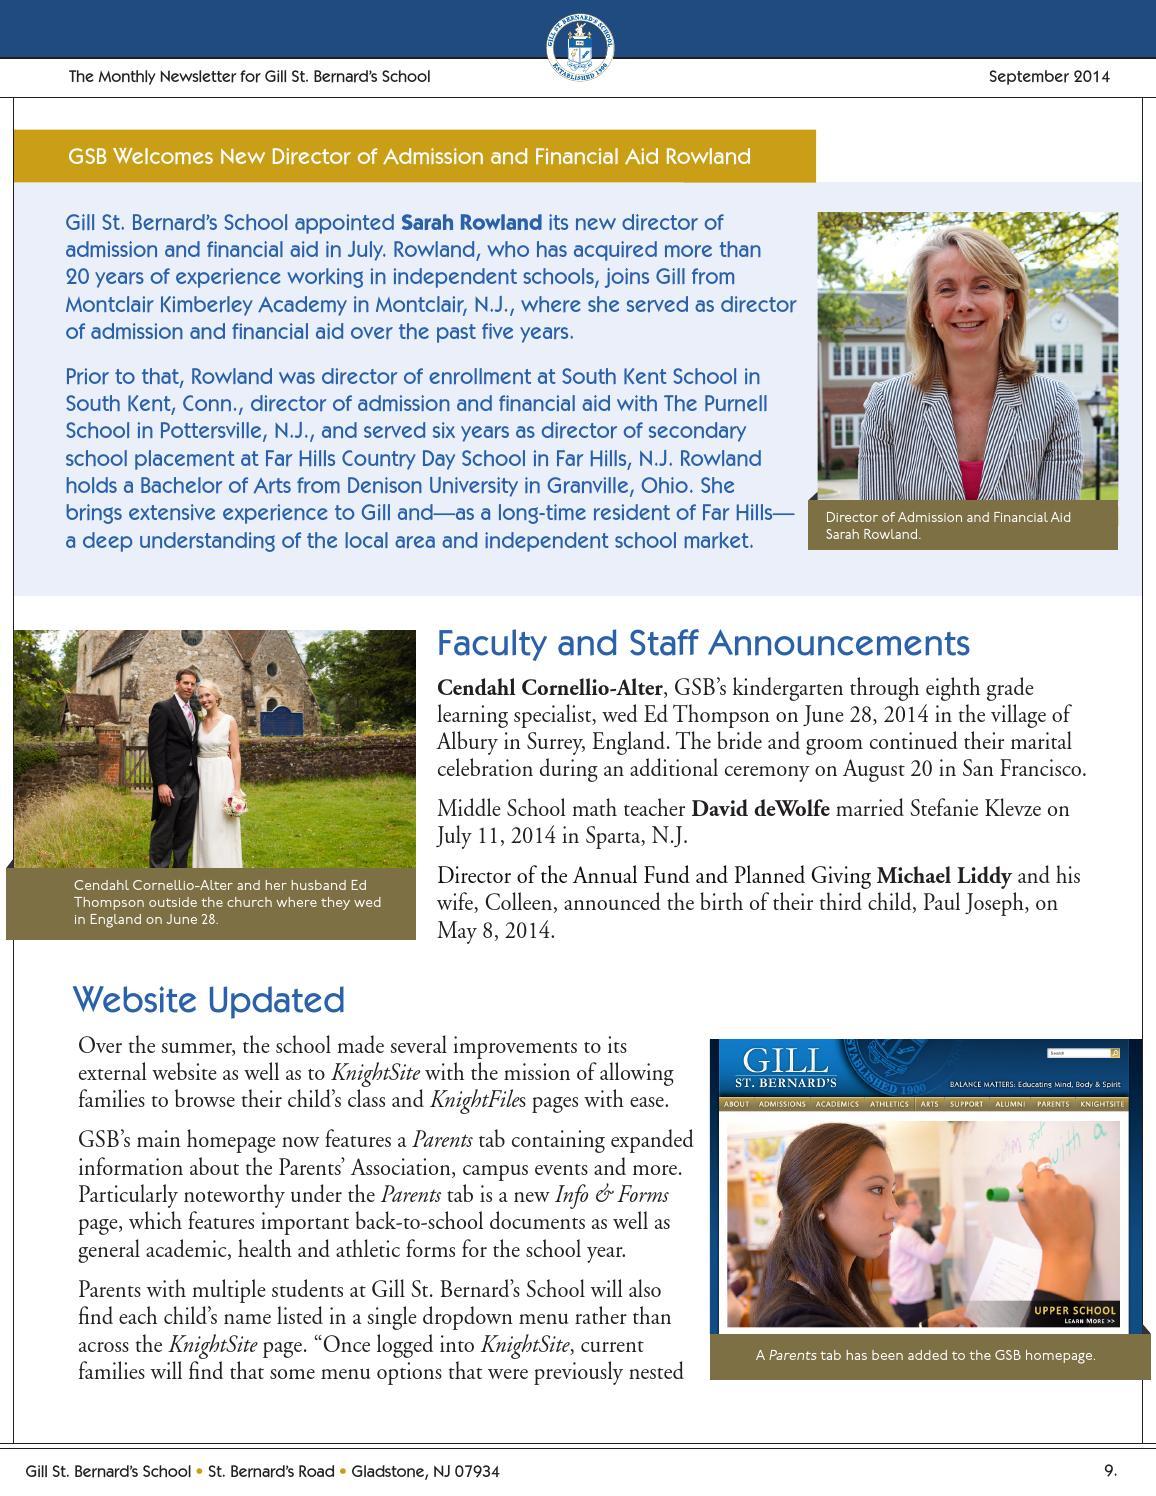 GSB News: September 2014 by Gill St  Bernard's School - issuu